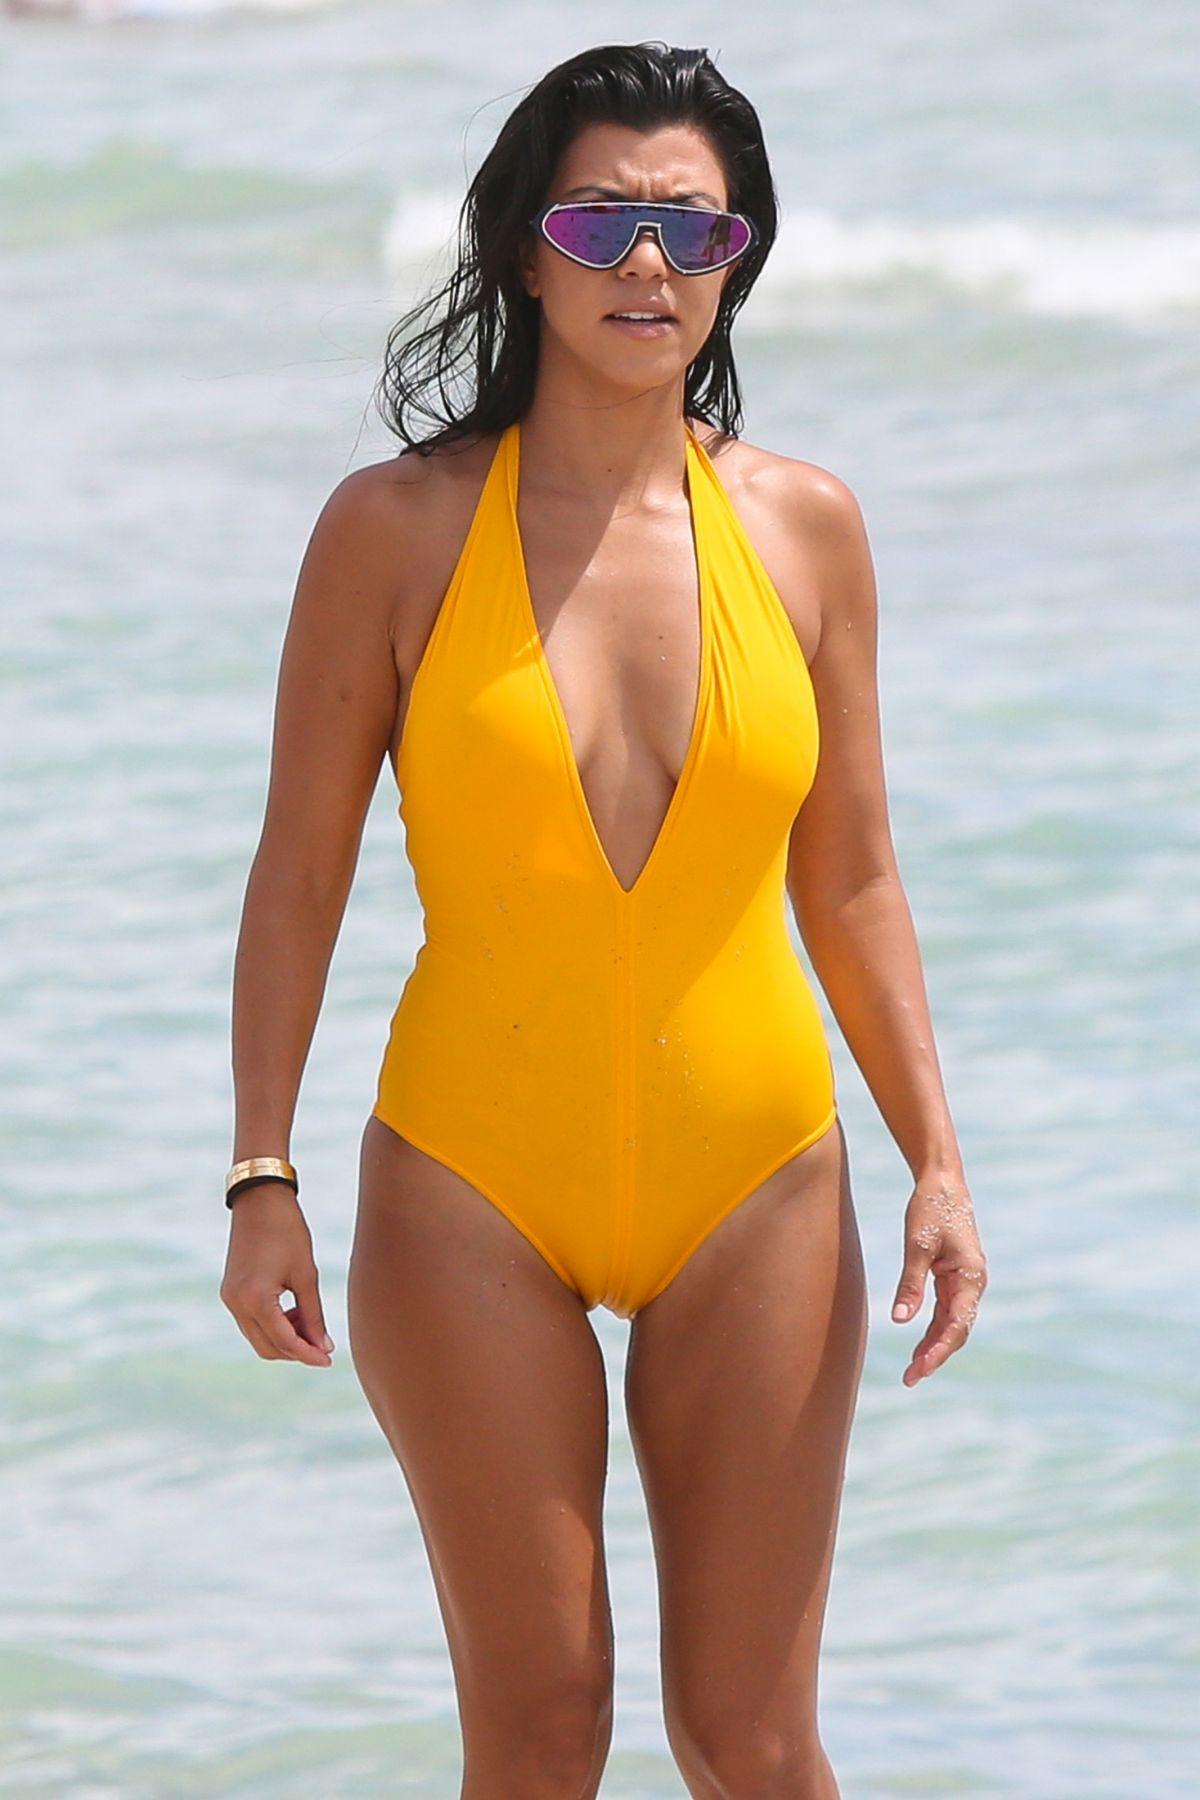 KOURTNEY KARDASHIAN in Swimsuit at a Beach in Miami 09/14/2016